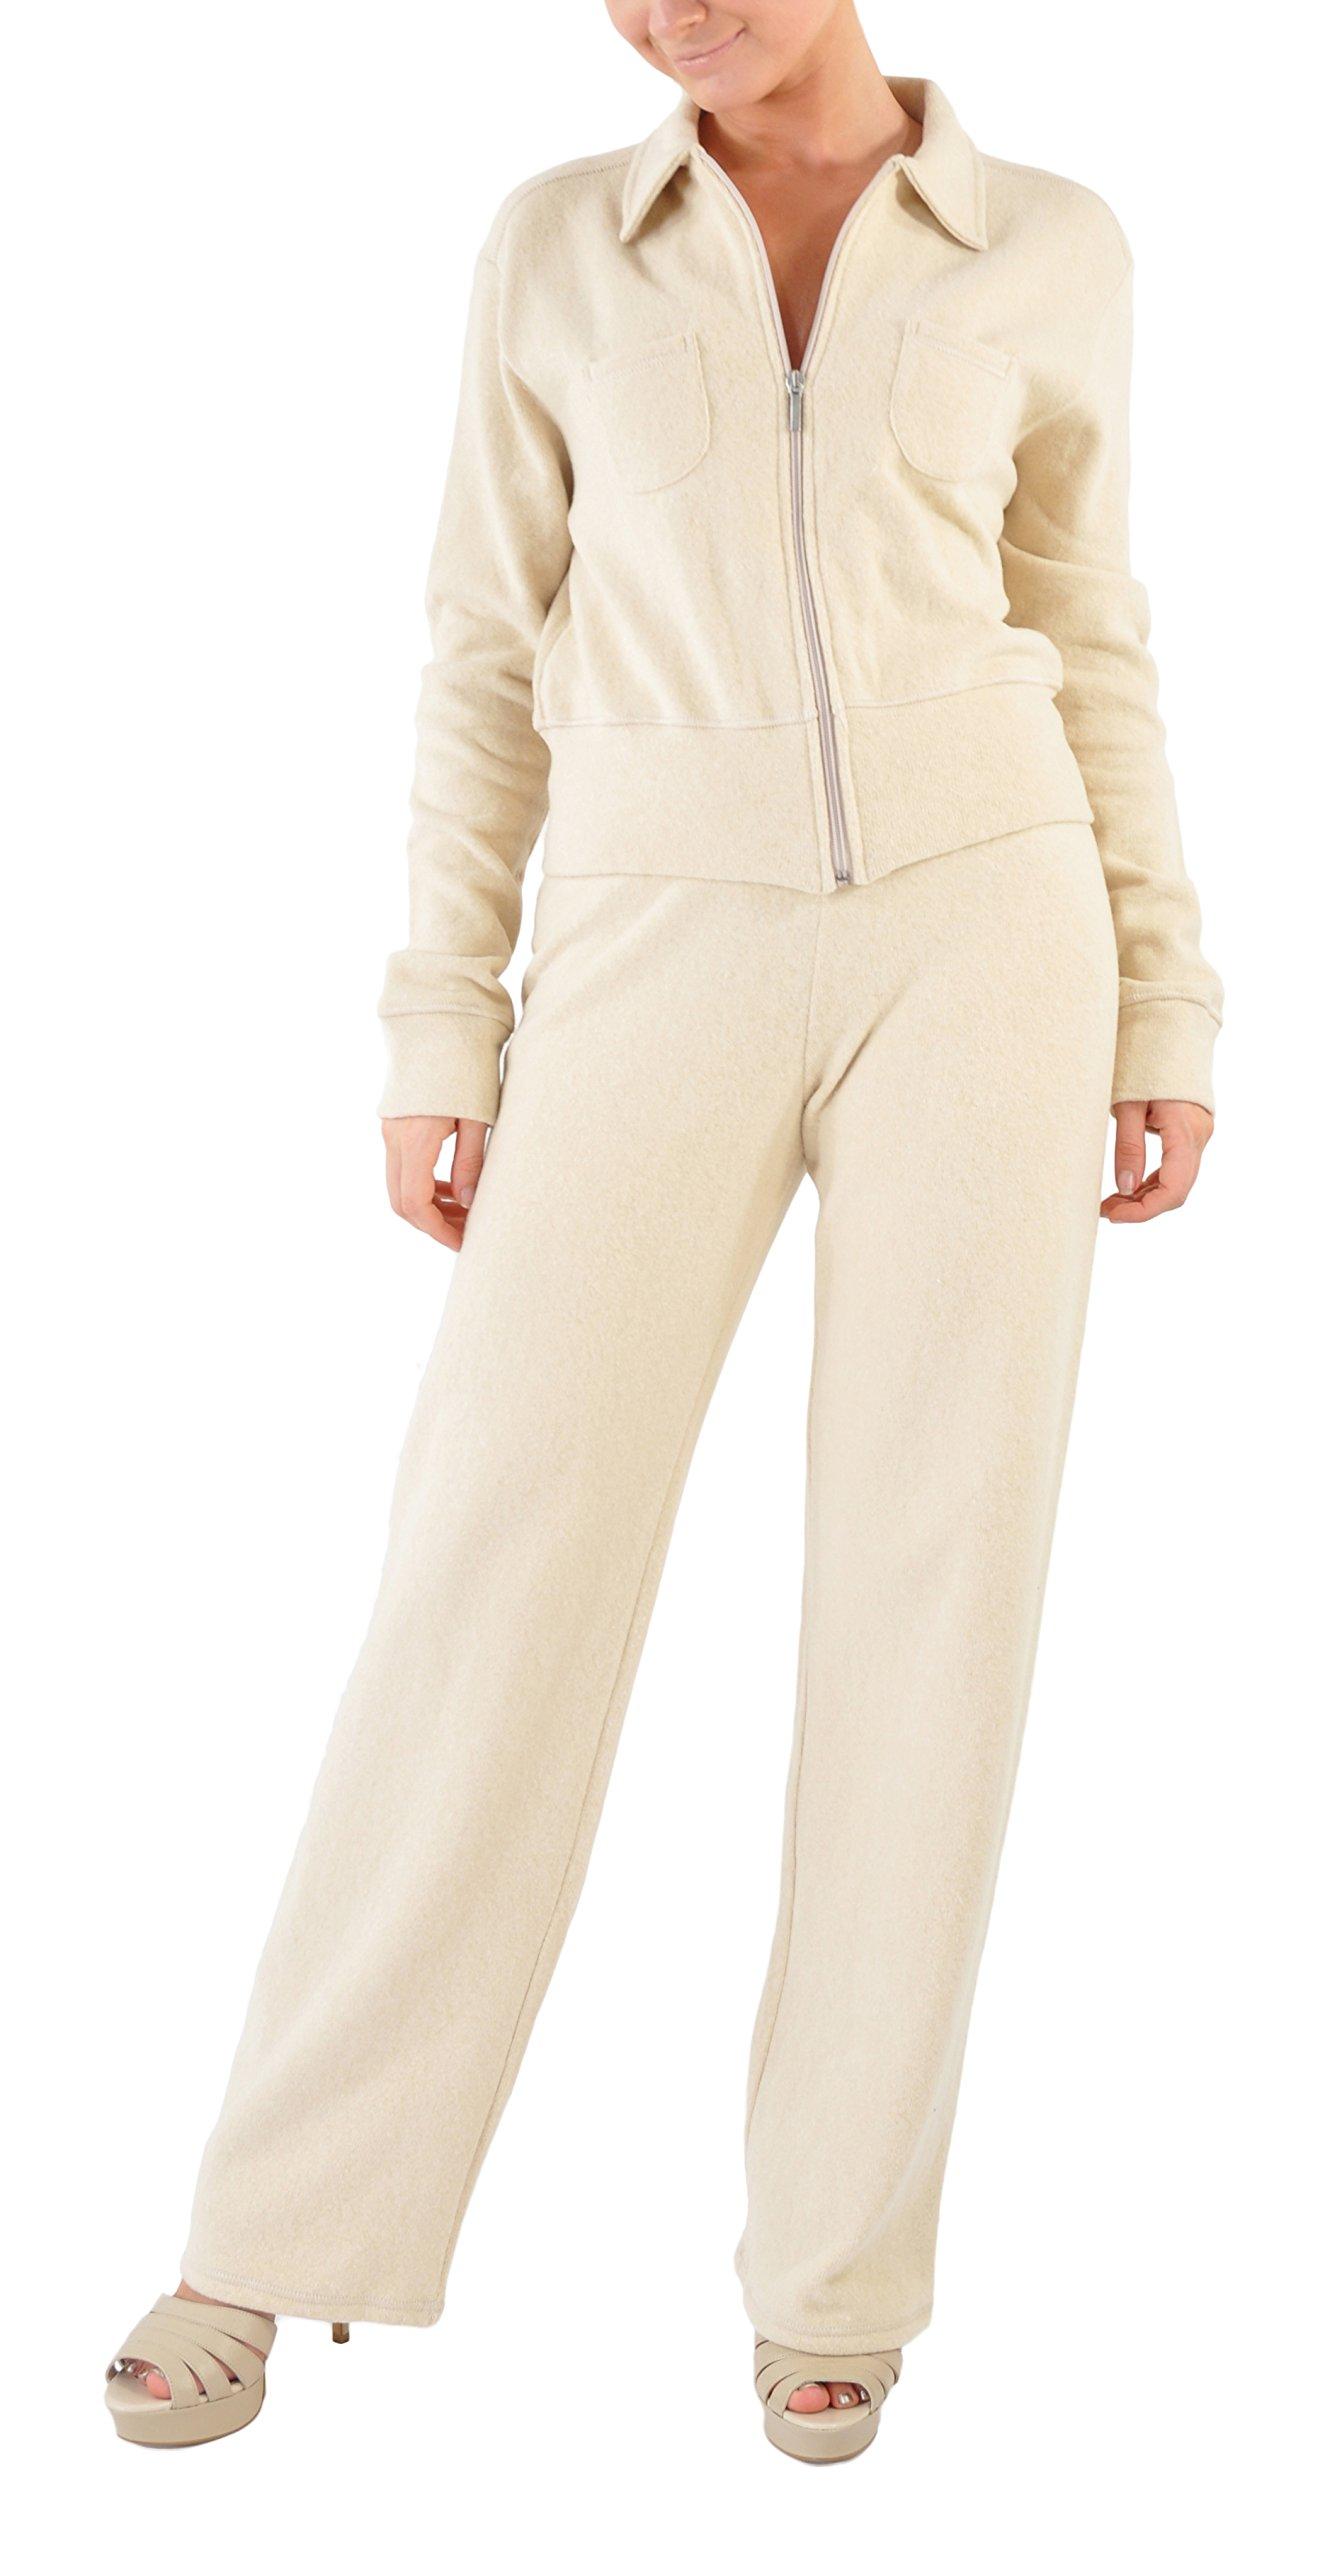 Zimmerli Luxury Loungewear/Warm Ups - Medium/Sand